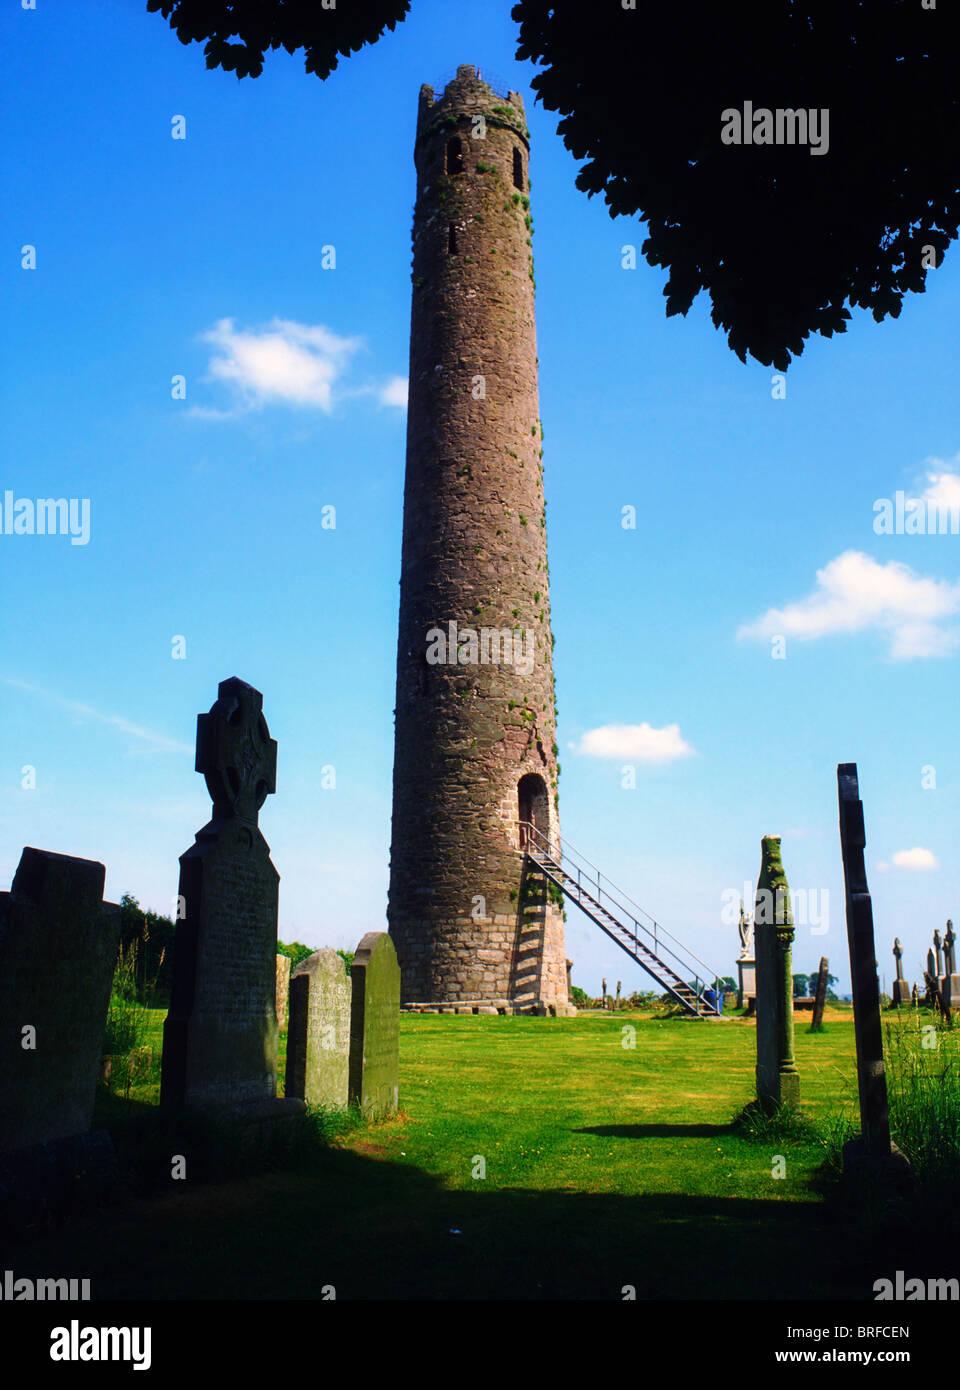 Castles of Leinster: Kilteel, Kildare © Mike Searle cc-by